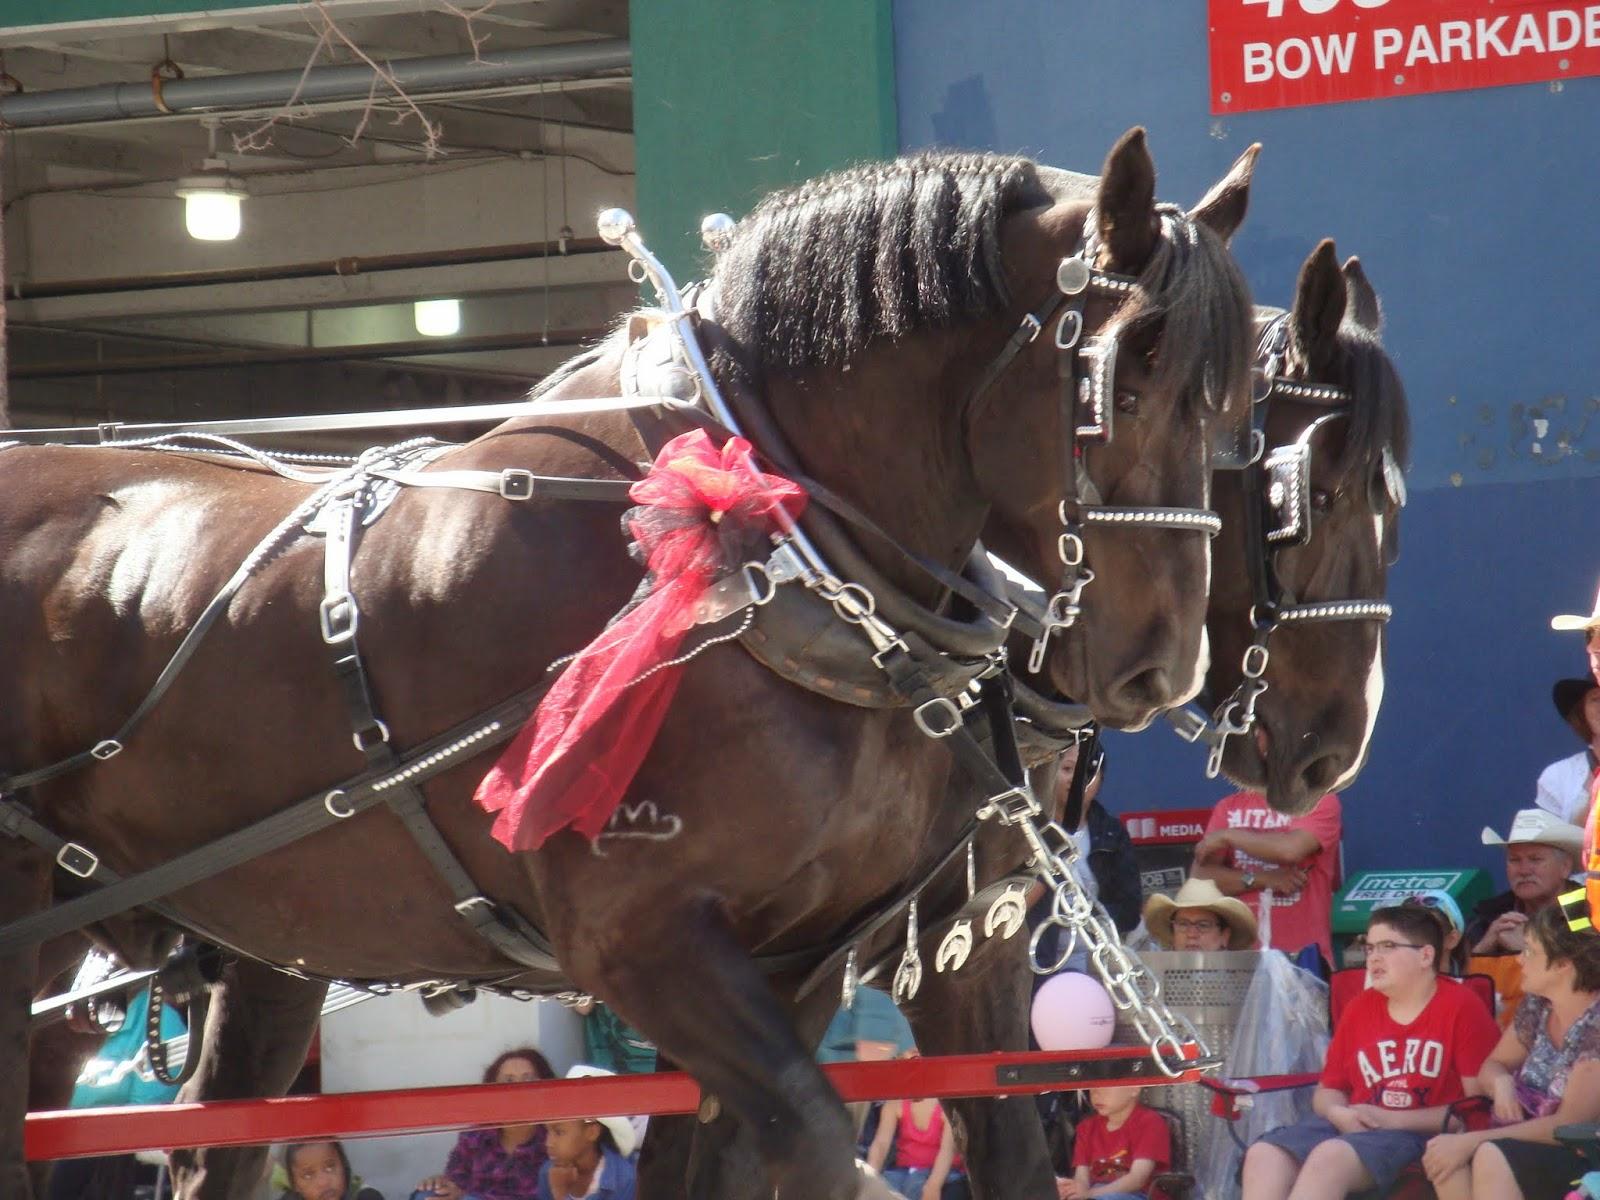 Alber 2014 Calgary Stampede Parade